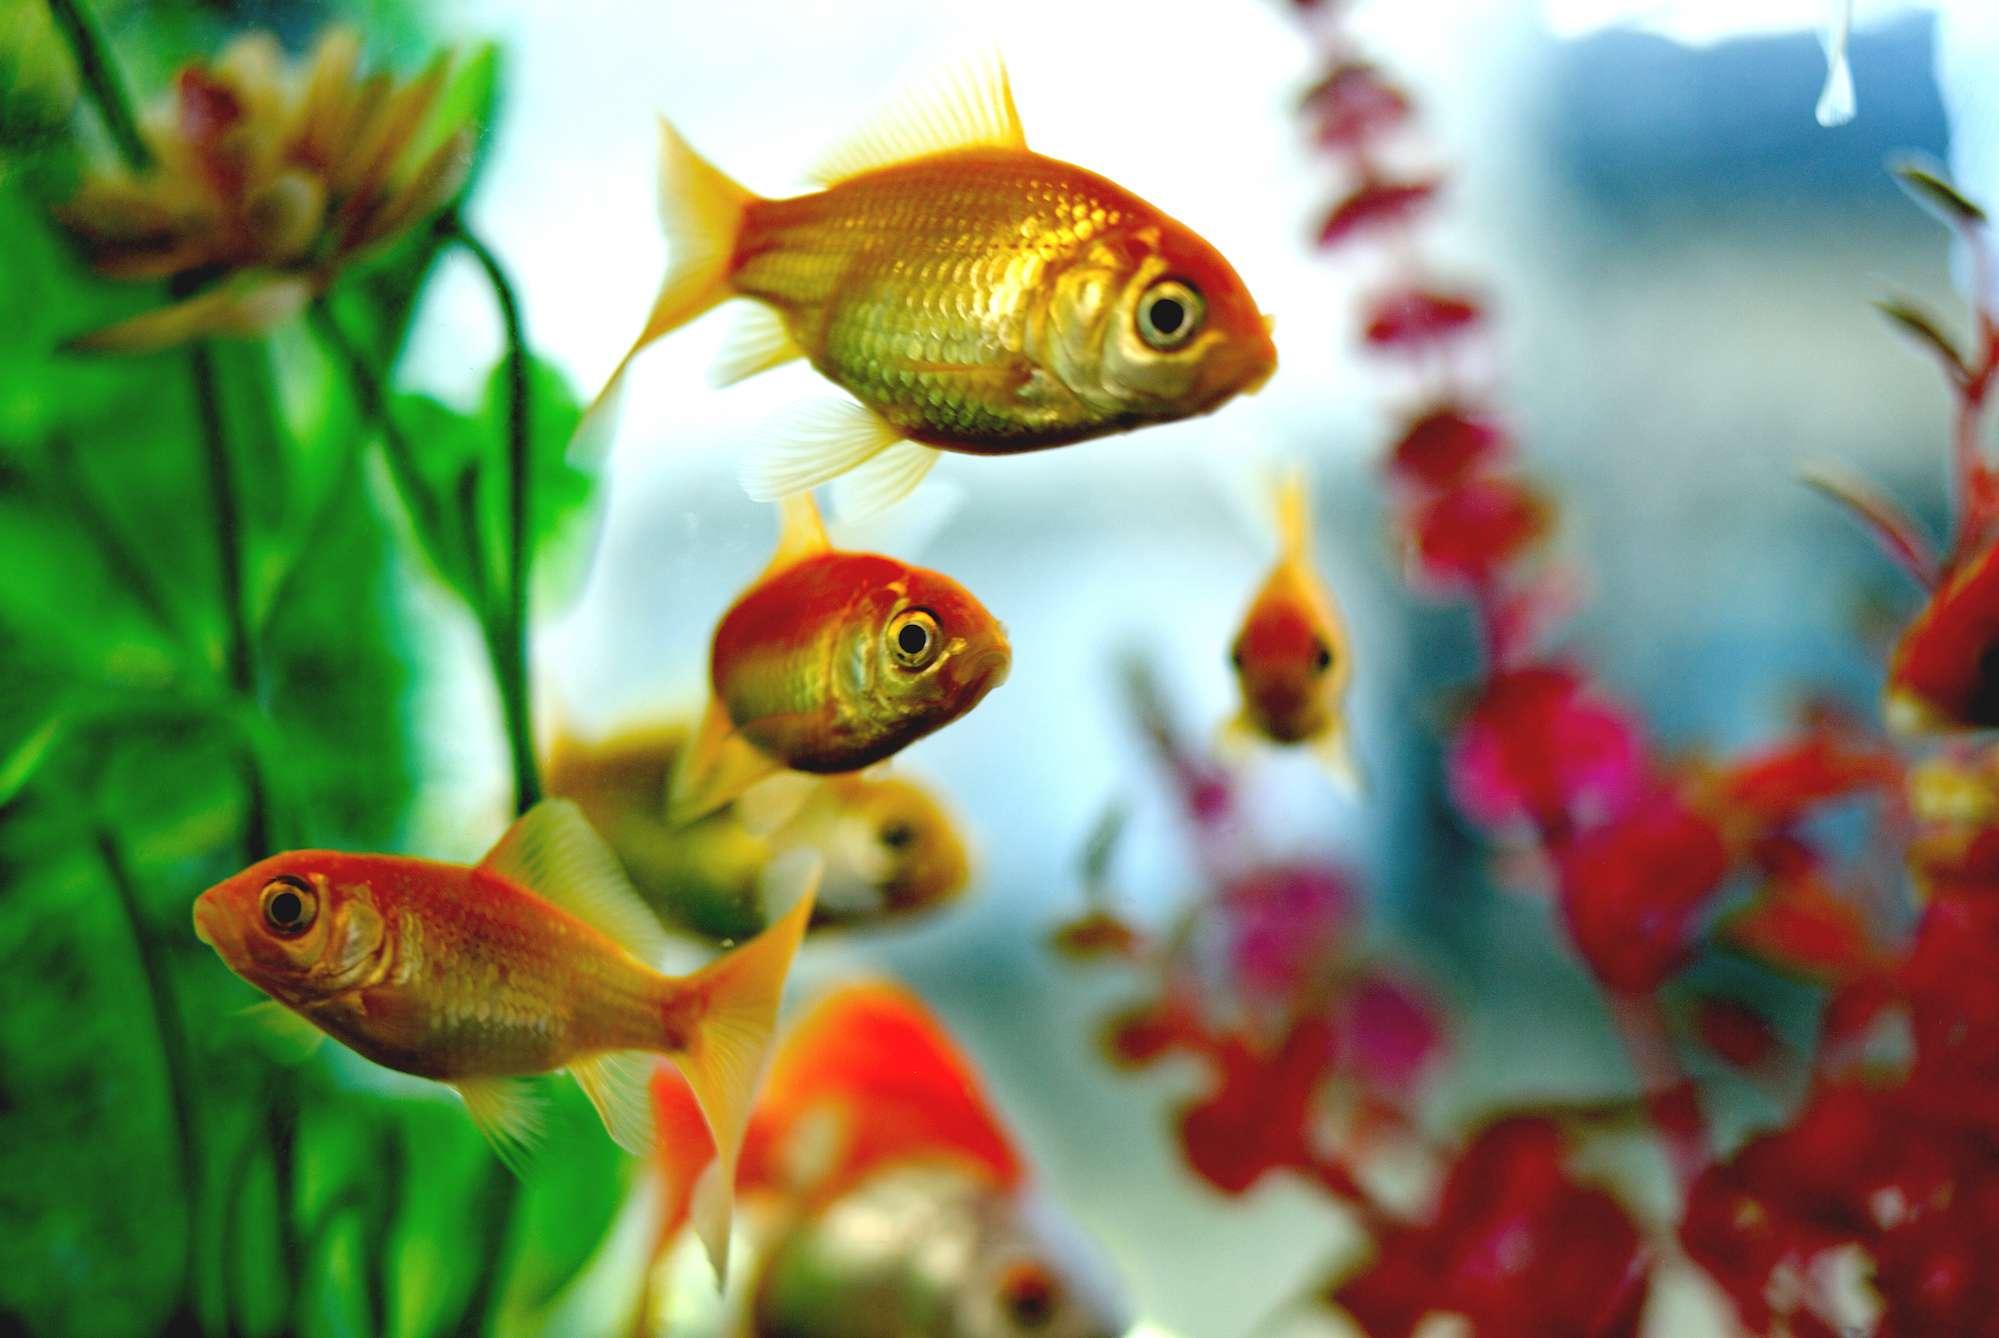 A close-up of goldfish in an aquarium